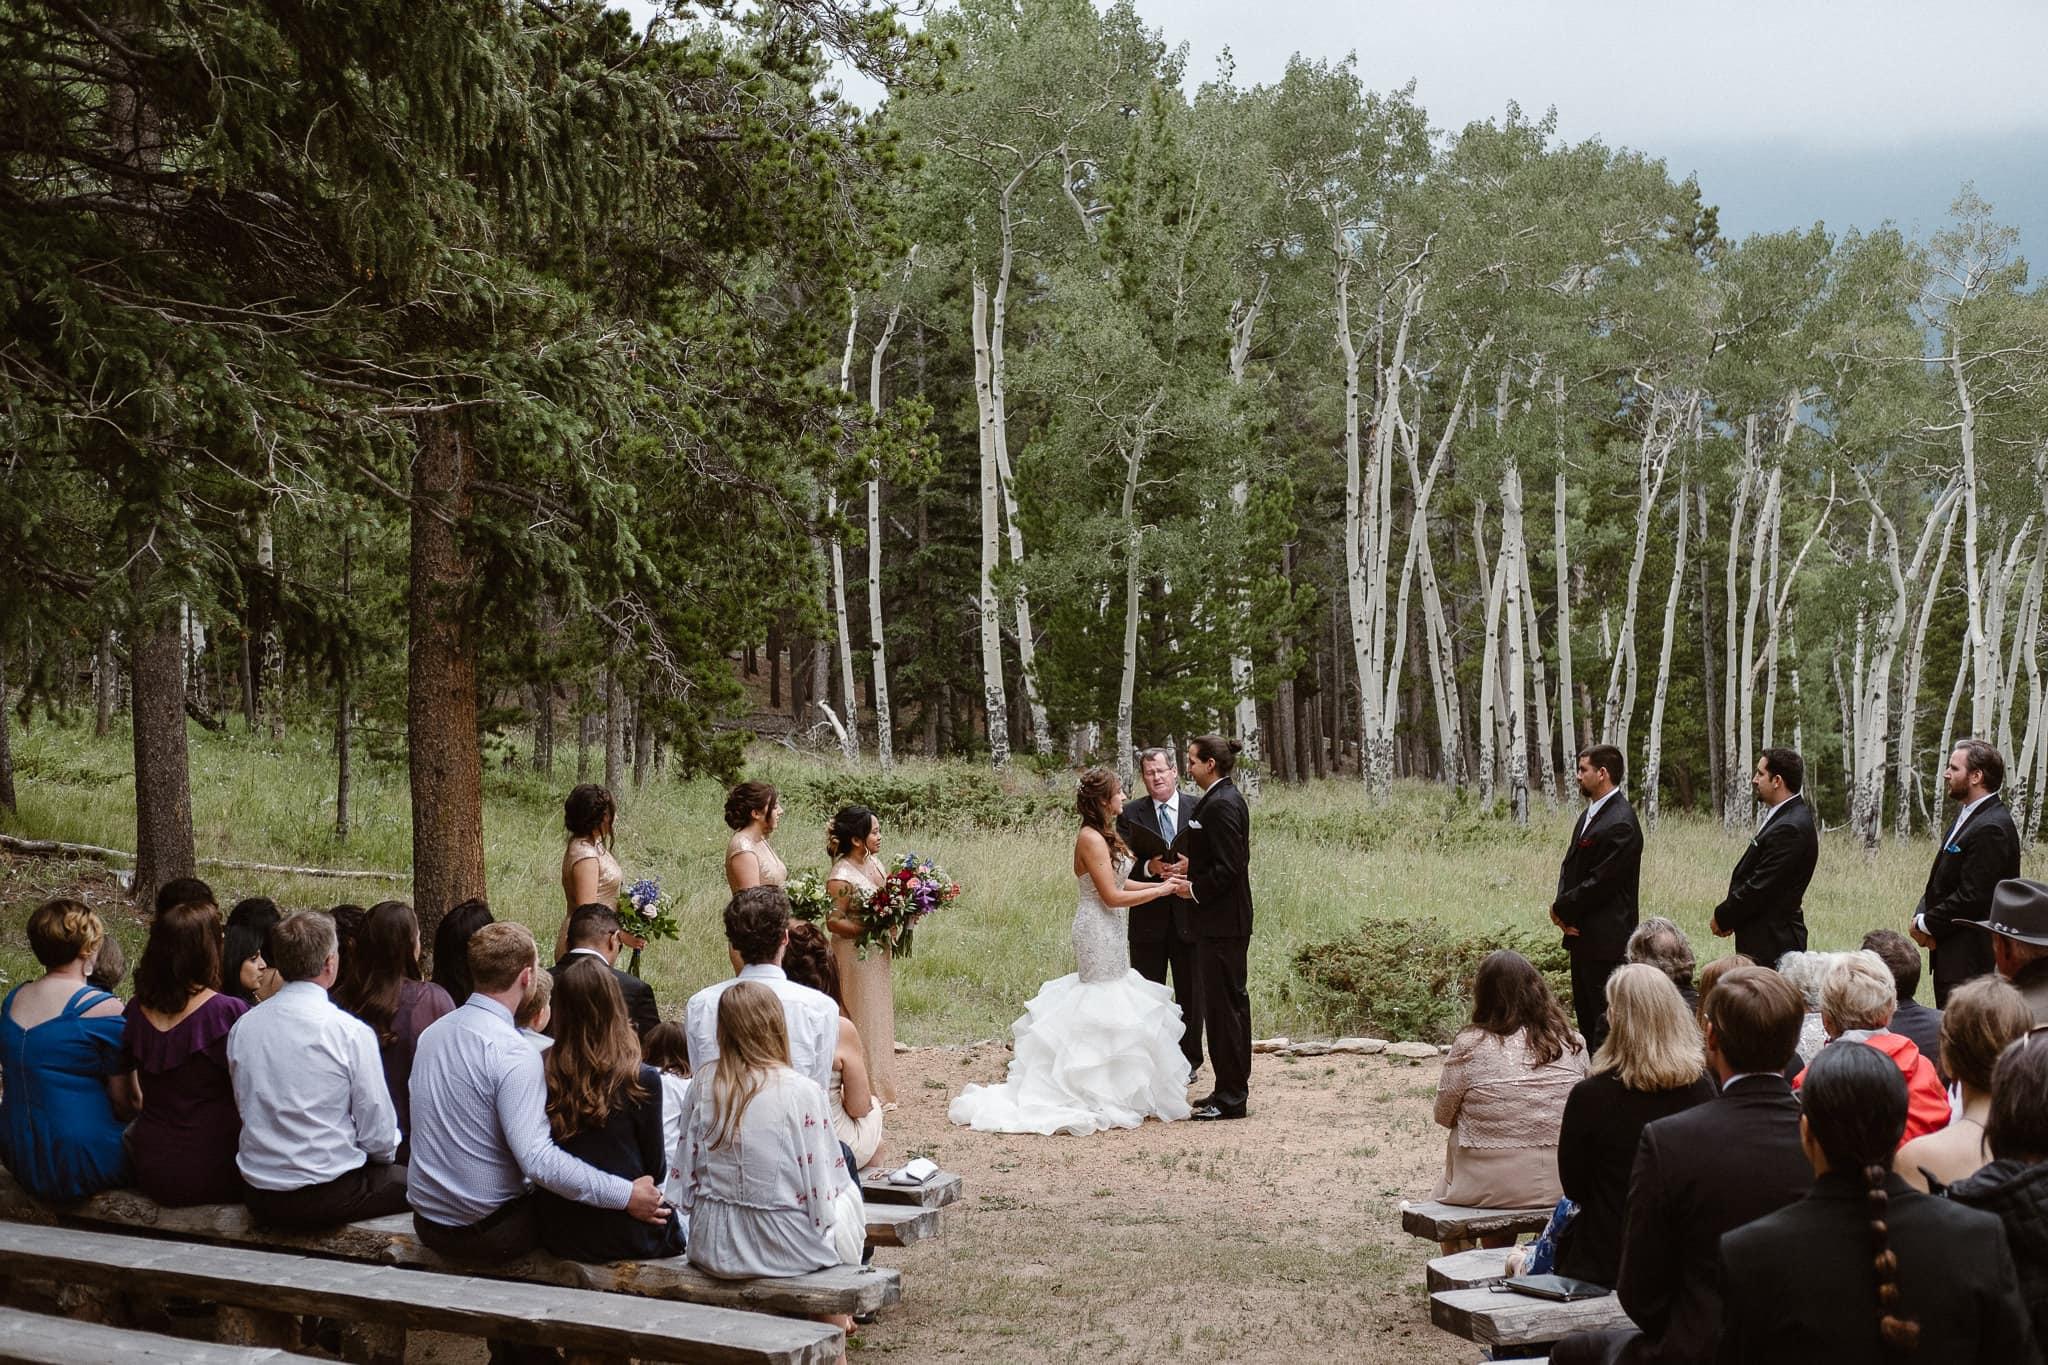 Dao House wedding photographer, Estes Park wedding venue, Colorado mountain wedding, outdoor ceremony, mountain ceremony,